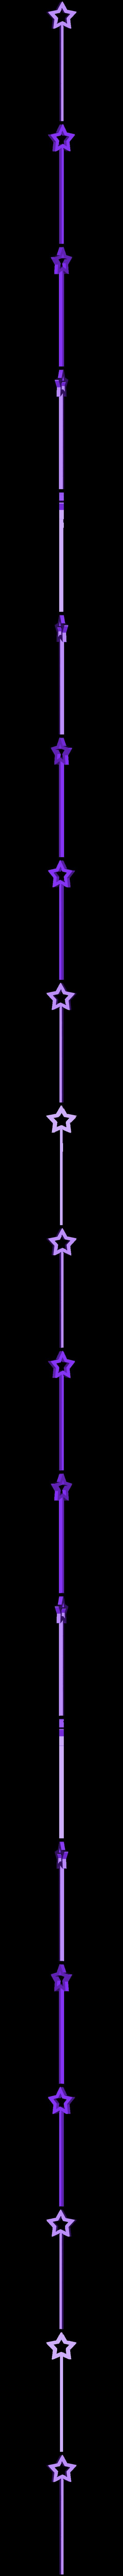 star_swizzle_stick_short_3dprintny.stl Download free STL file Holiday Party Picks and Swizzle Sticks • 3D print model, barb_3dprintny